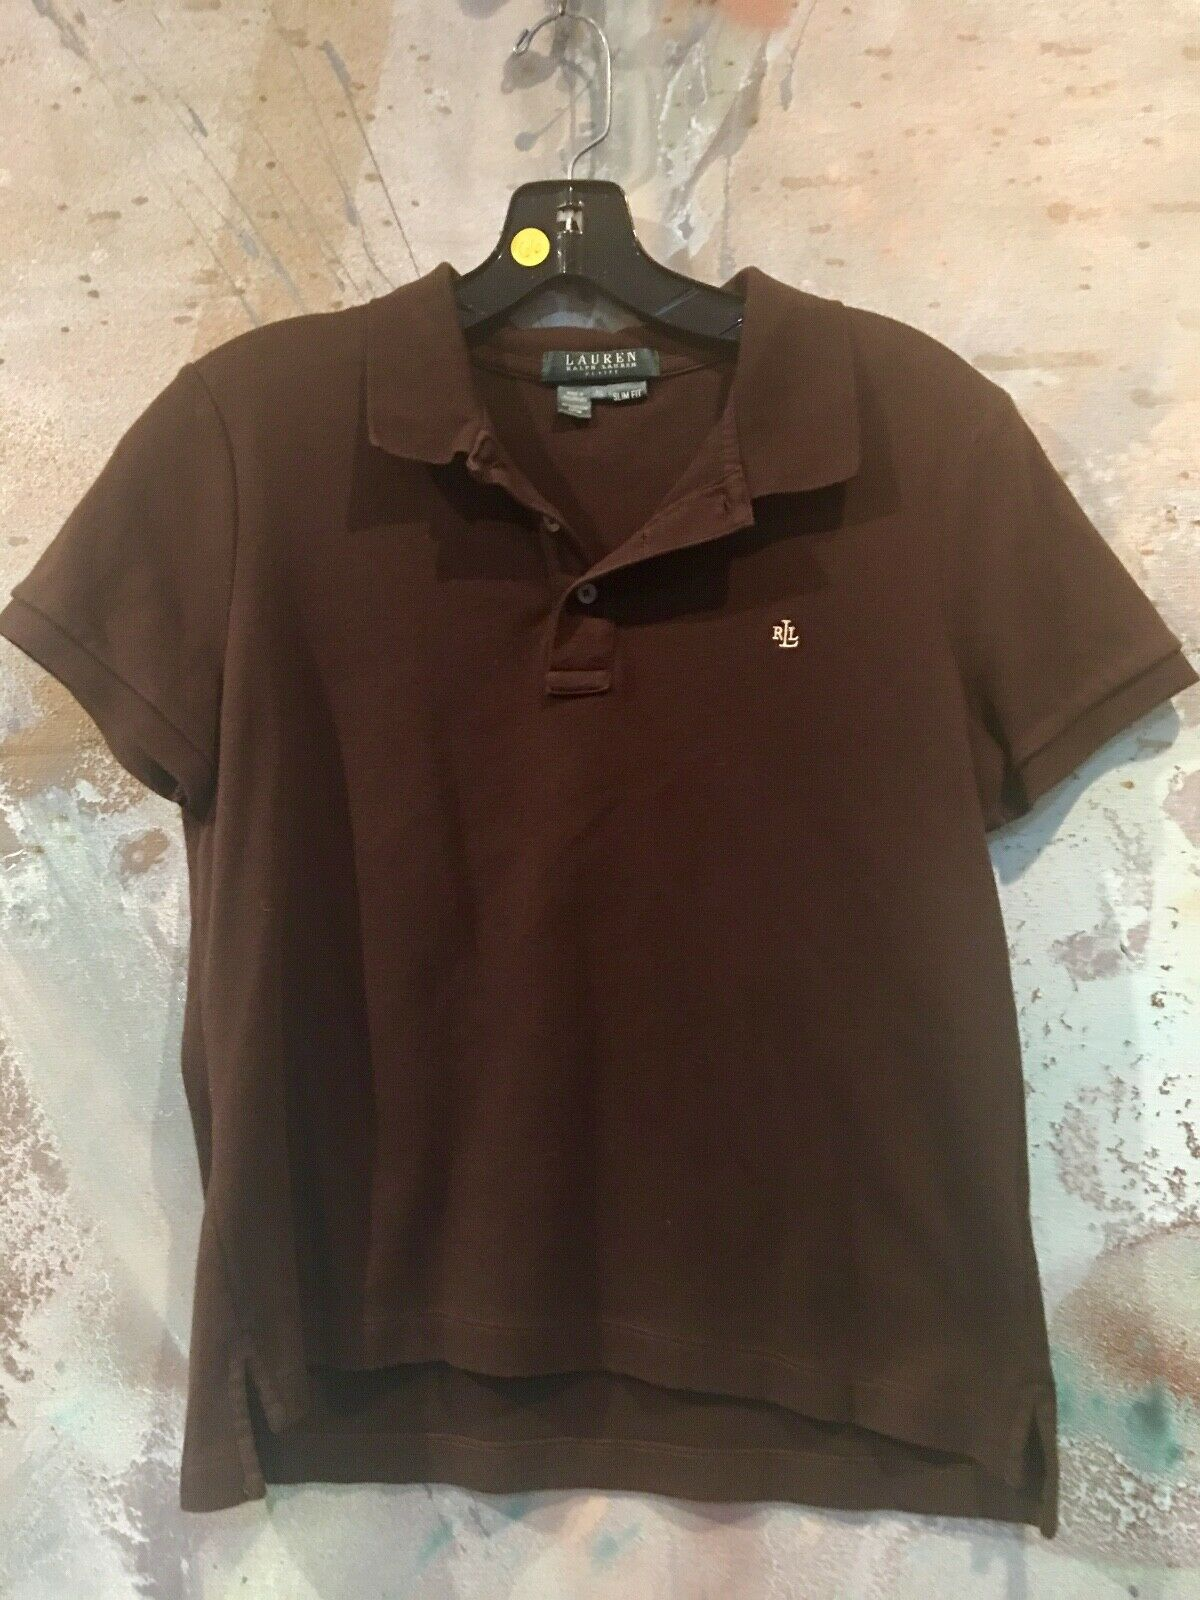 LAUREN RALPH LAUREN Petite braun Polo Shirt Top damen Größe PL EUC Slim Fit